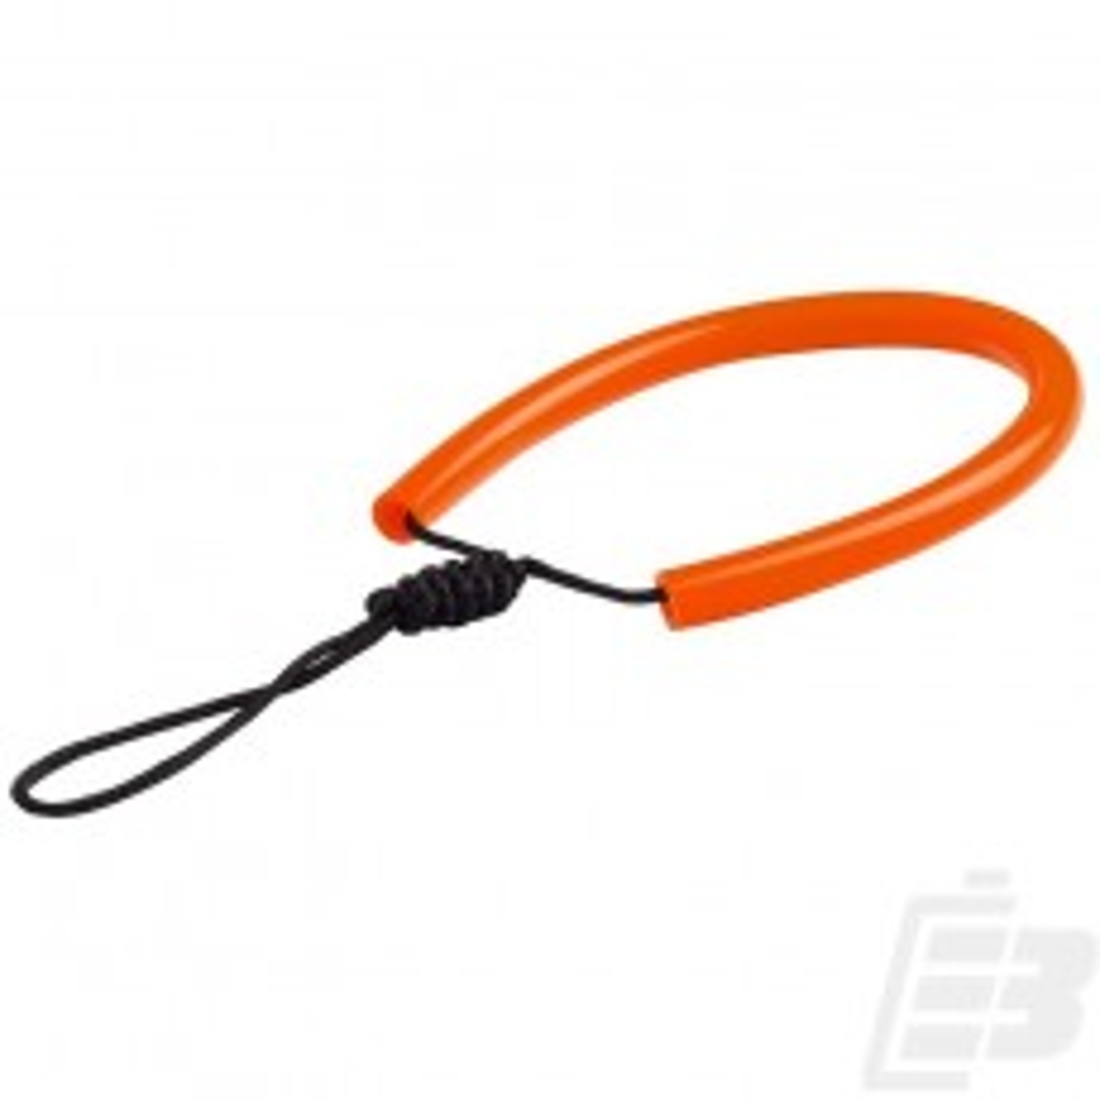 Fenix ALL-01 Soft Flashlight Lanyard